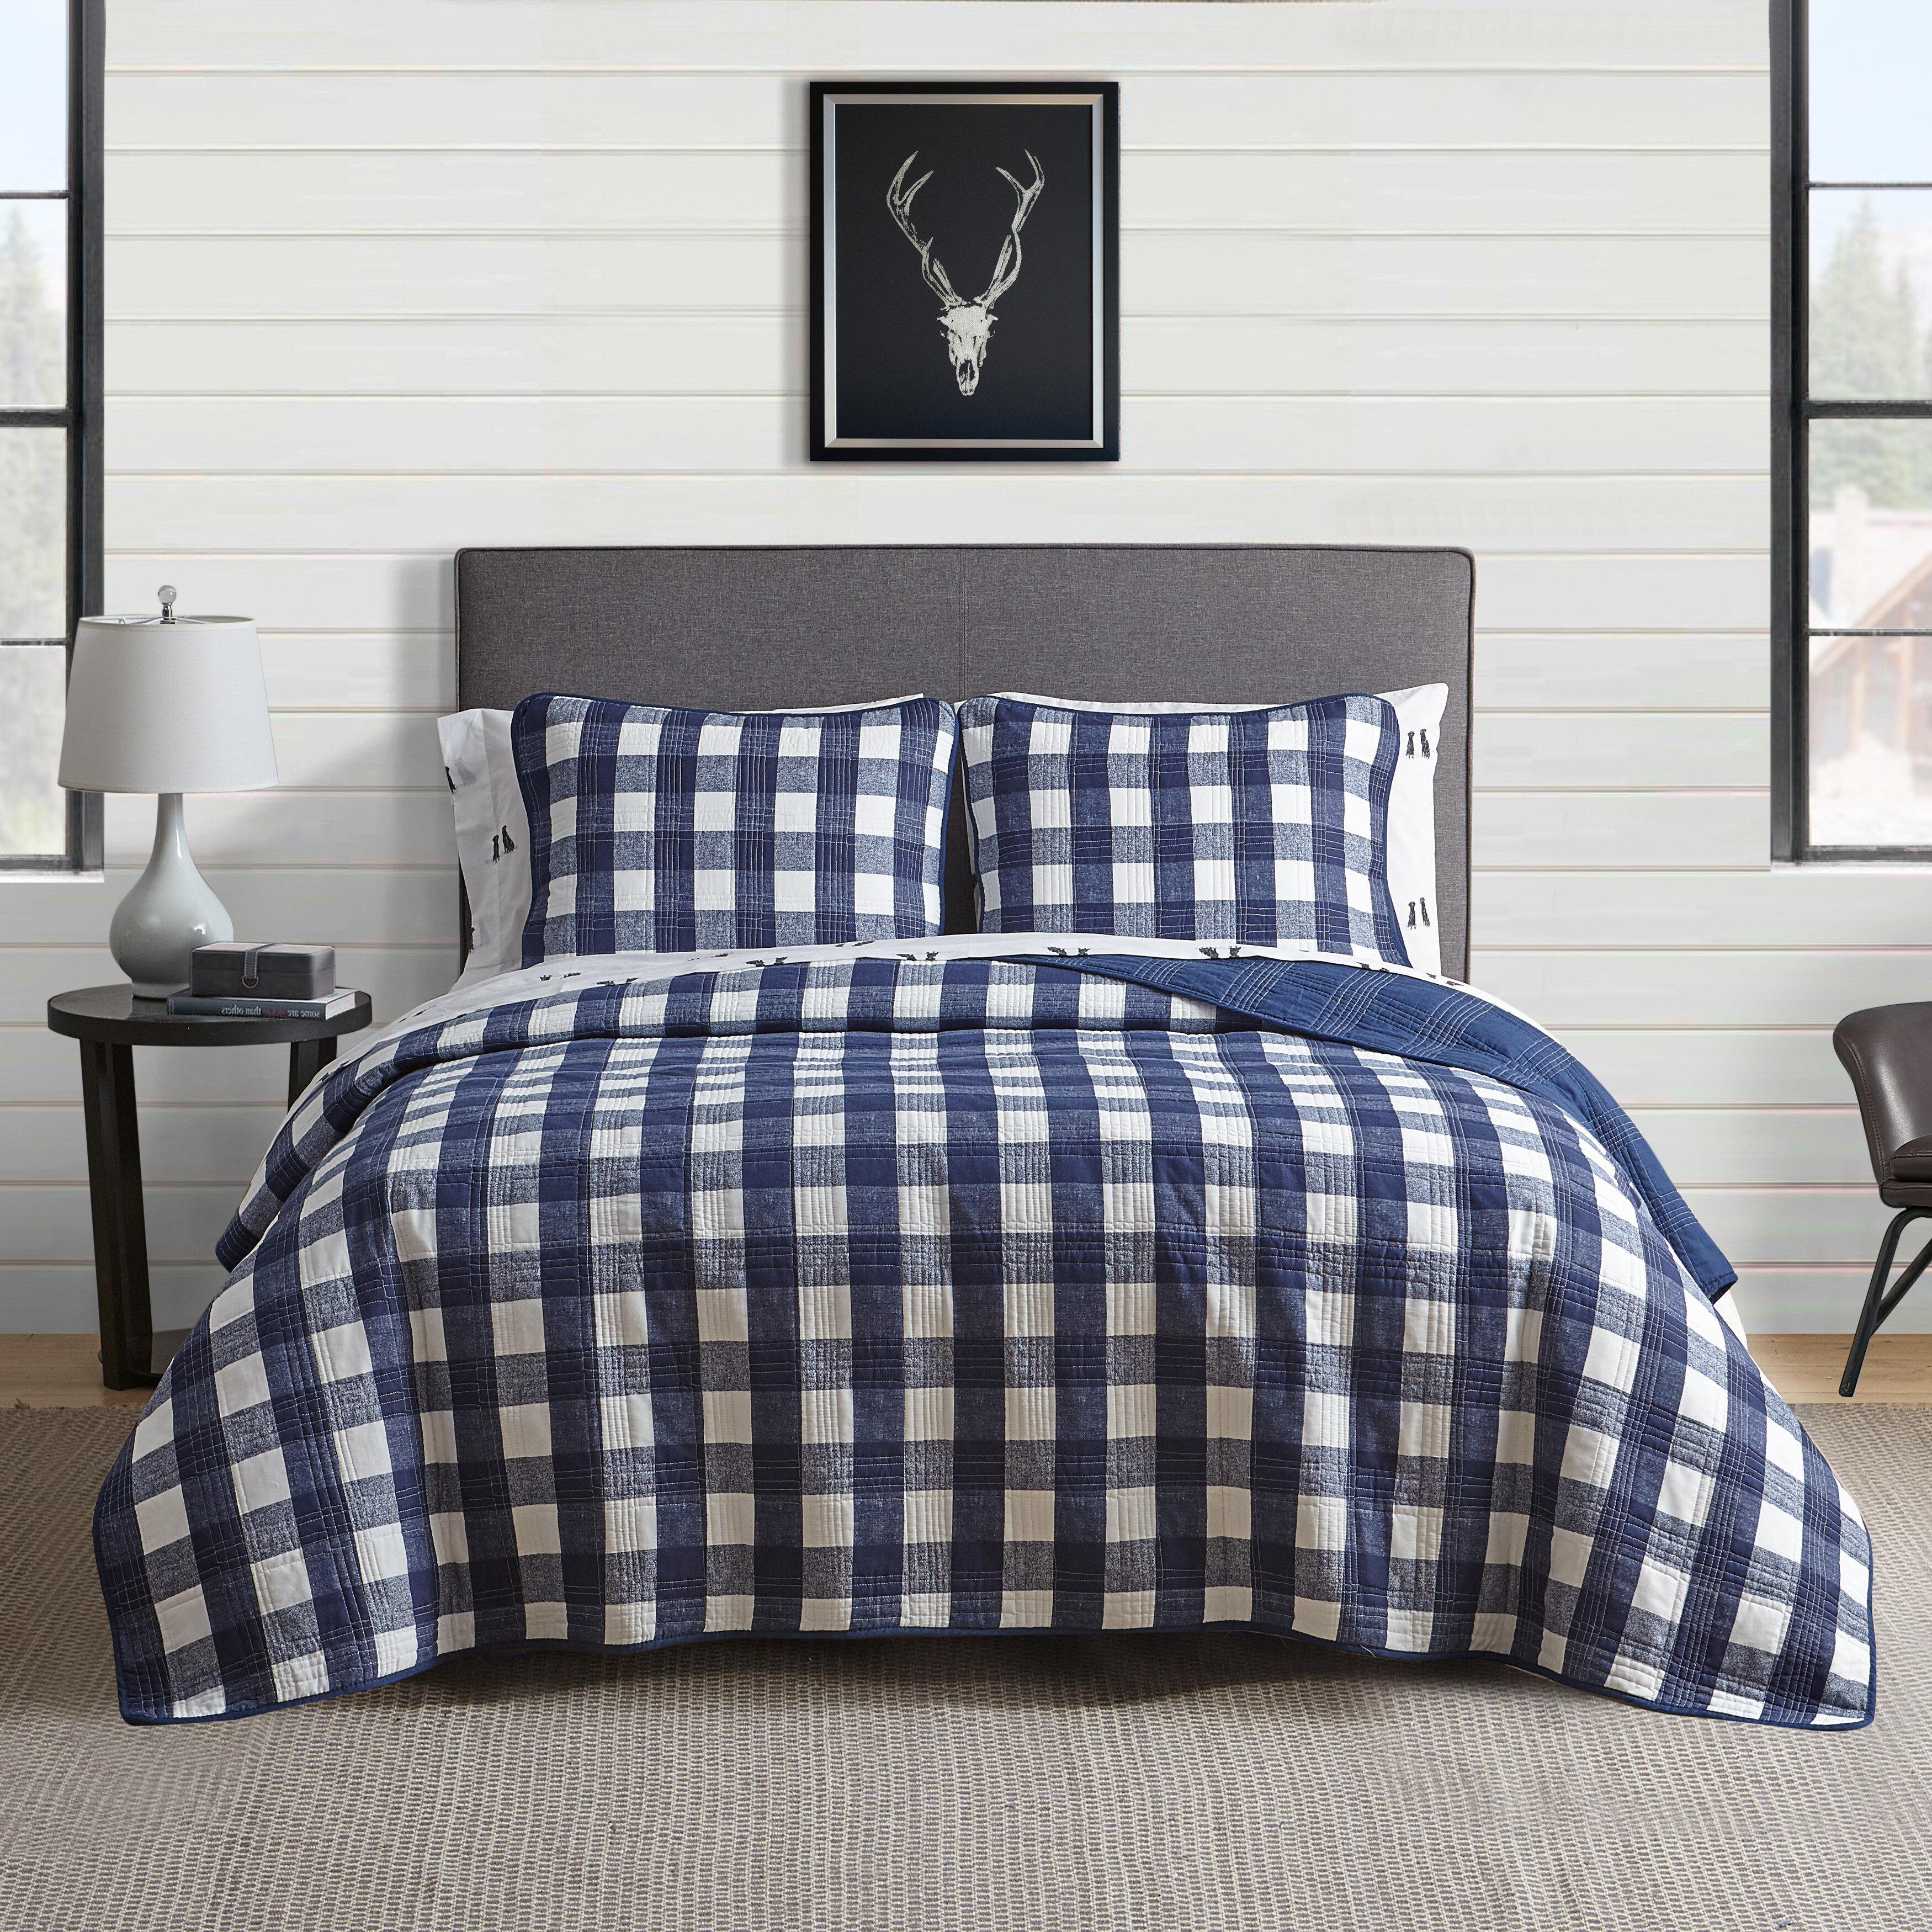 Blue Rustic Bedding You Ll Love In 2021 Wayfair